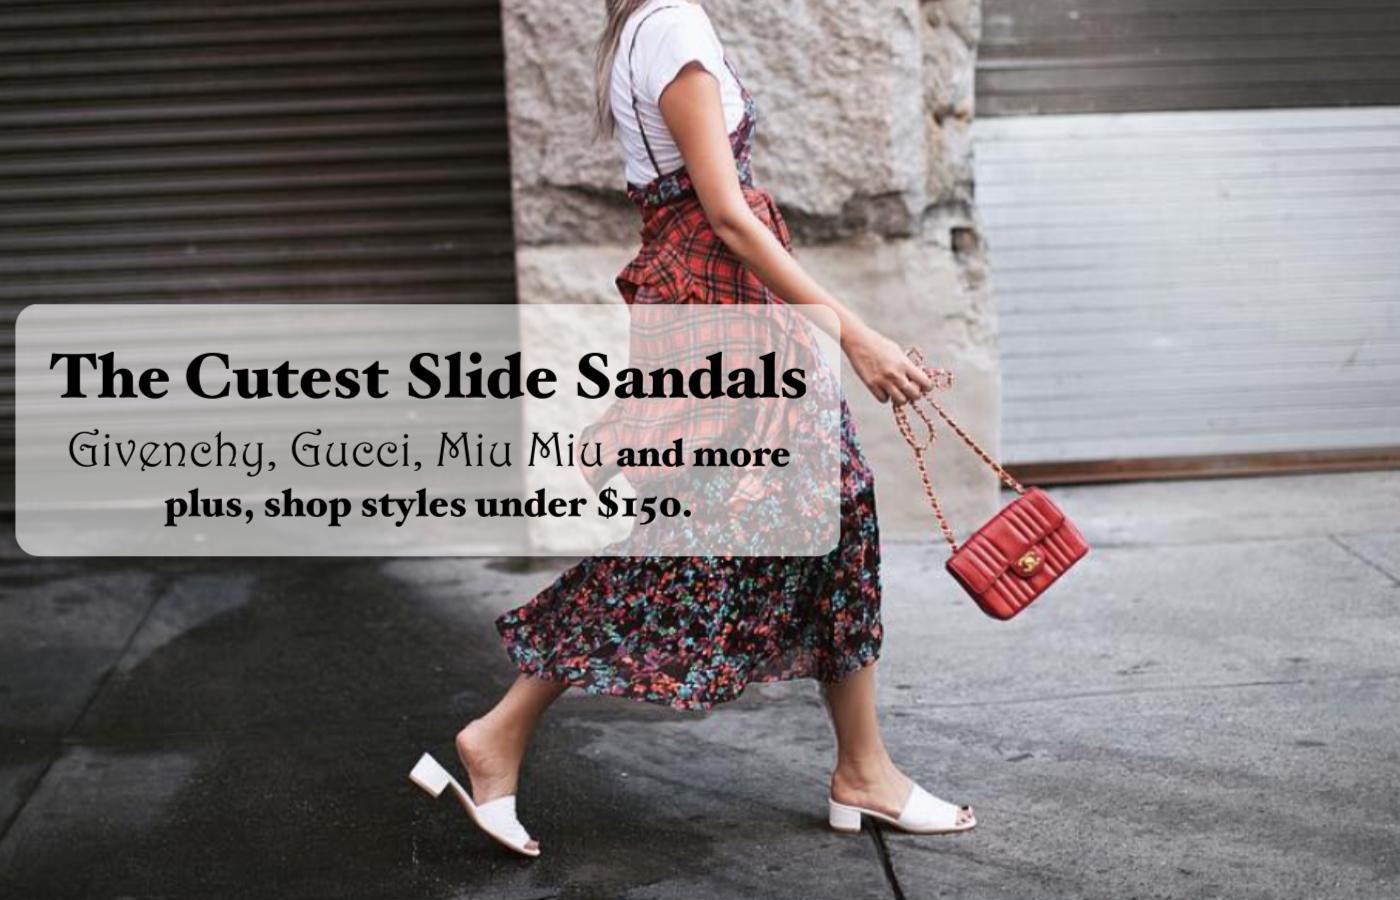 The best designer slide sandals plus Givenchy slides! And cheap slides for women under $150. #fall2016